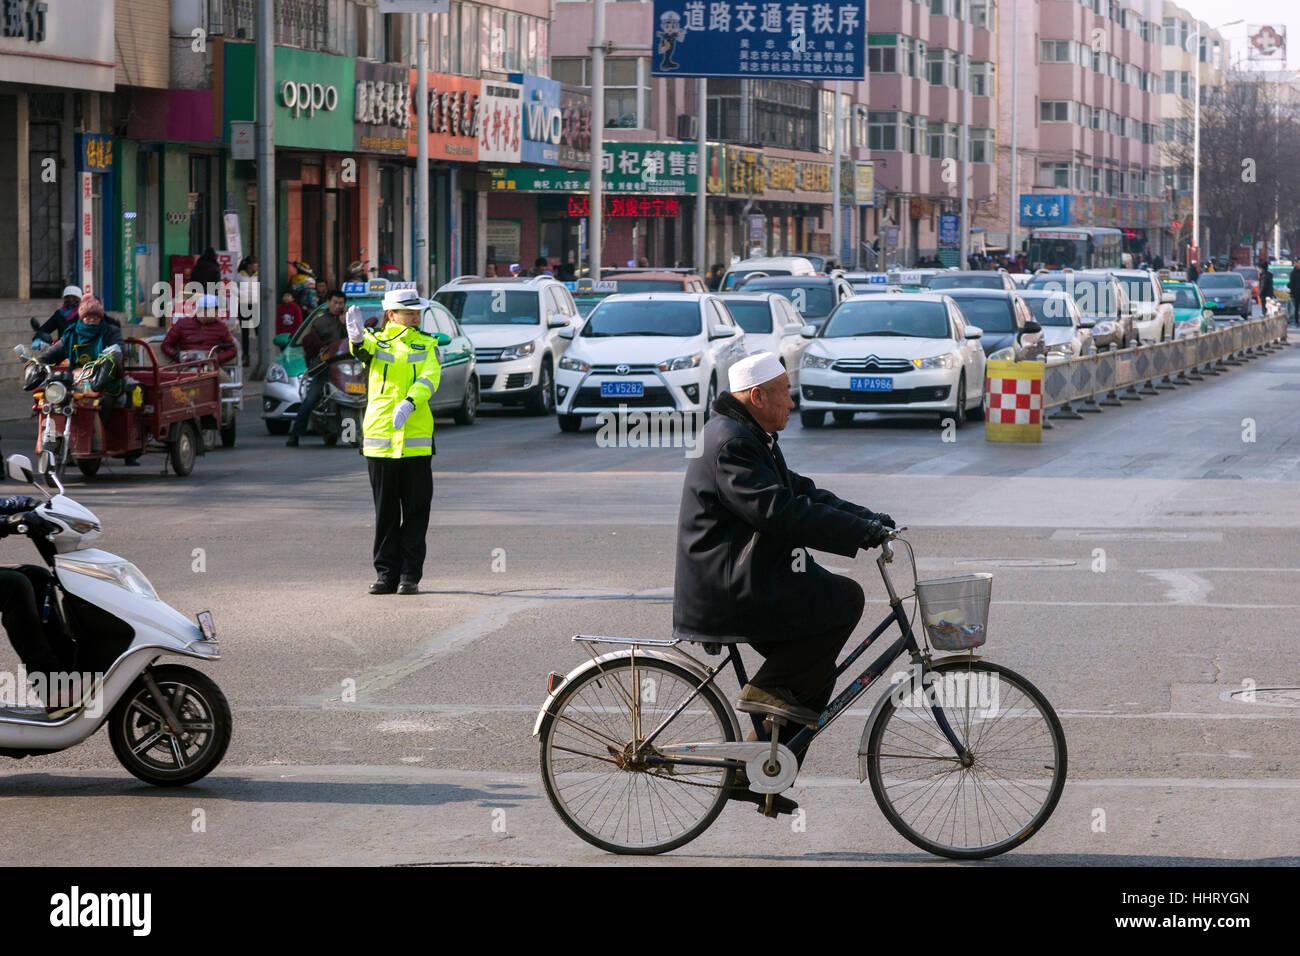 Police controling traffic at road junction, Wuzhong, Ningxia province, China - Stock Image